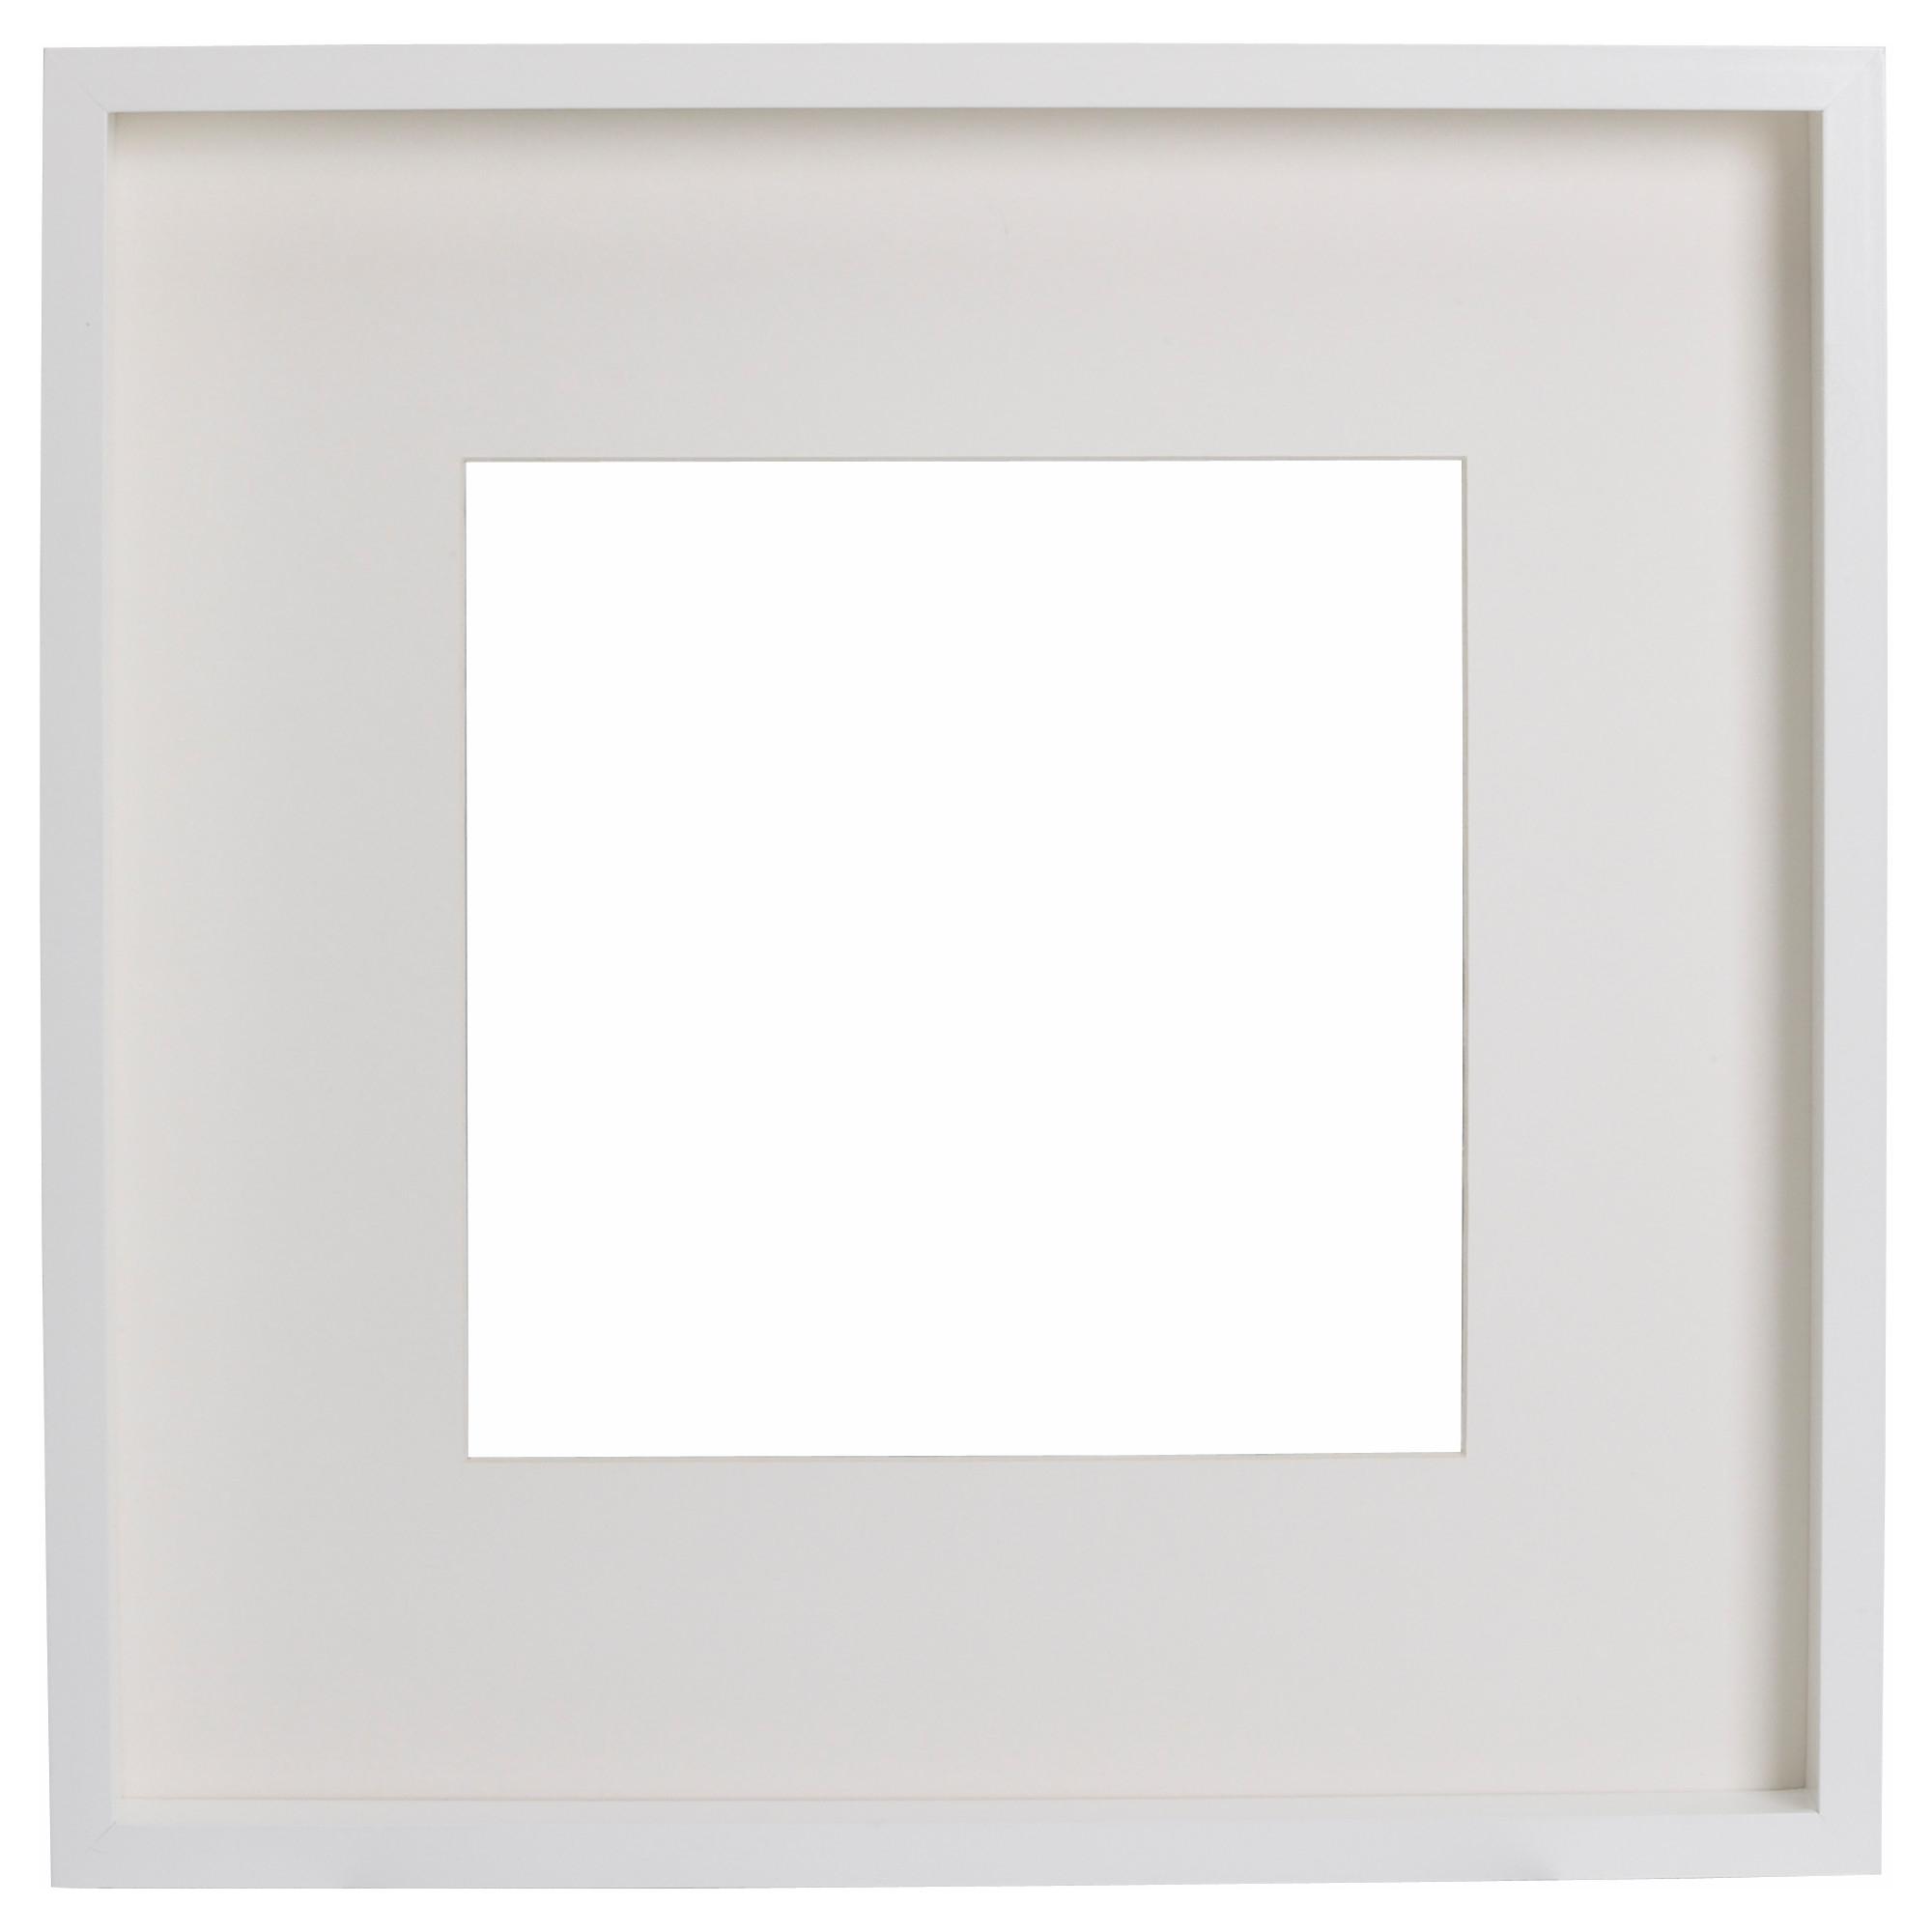 Ribba marco 50x50 blanco - Ikea marco fotos ...